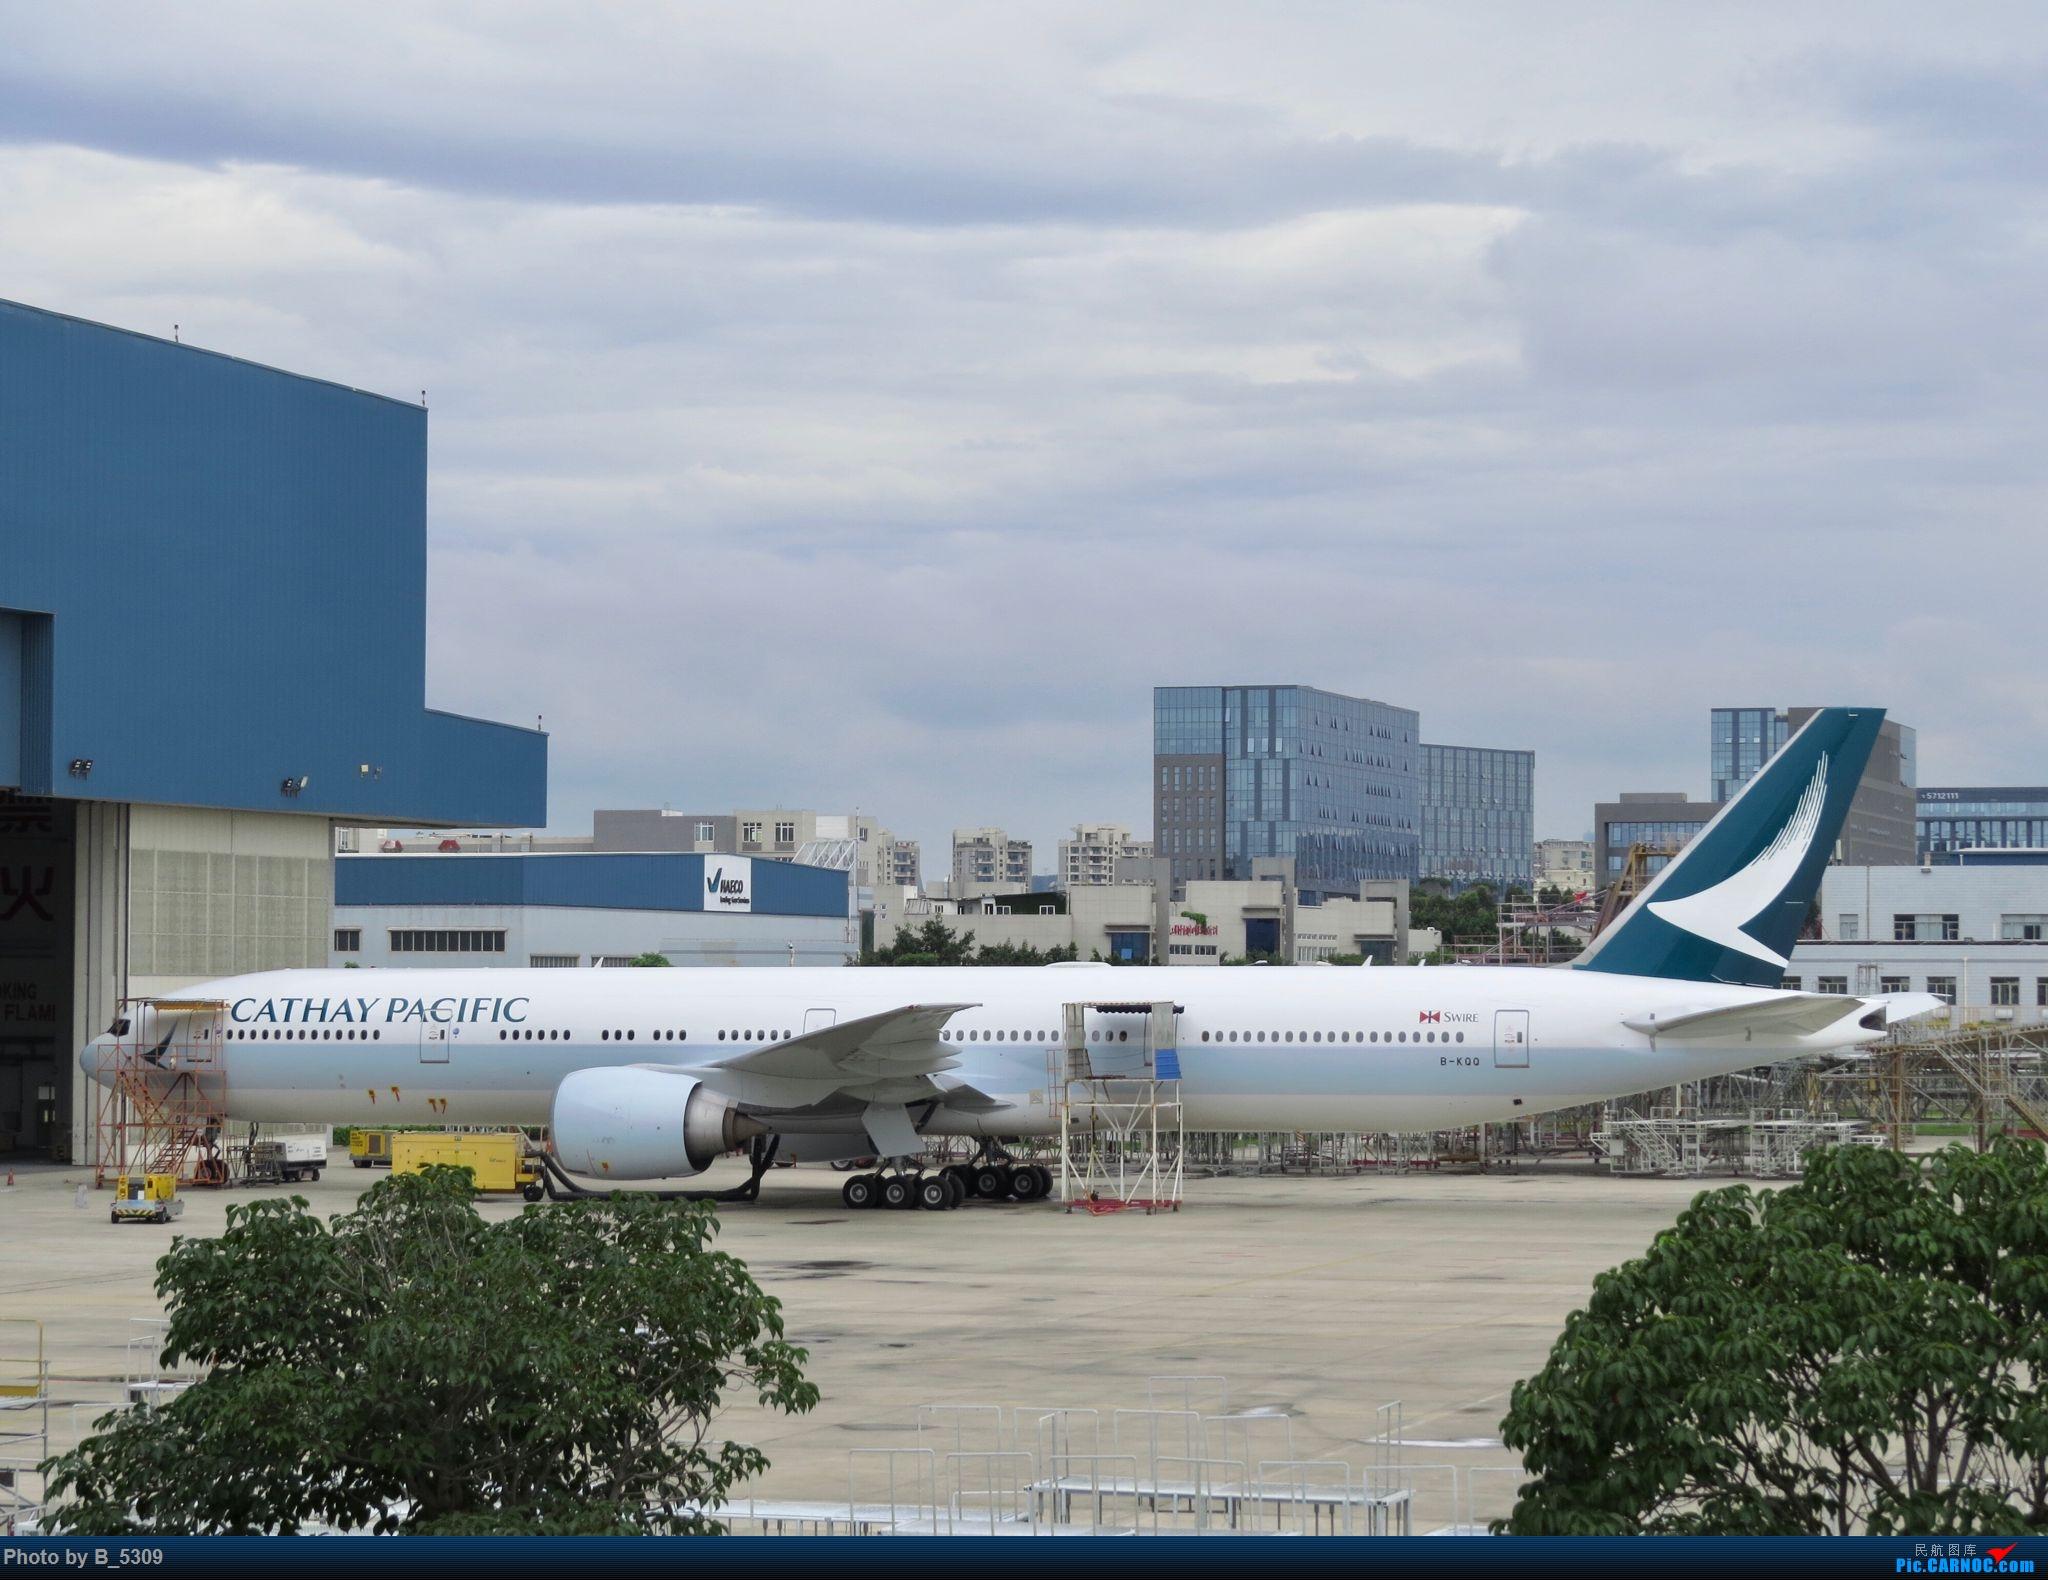 Re:[原创]复课一个月了,终于能在紧张的学习生活中抽出点时间拍稽~ BOEING 777-300ER B-KQQ 中国厦门高崎国际机场